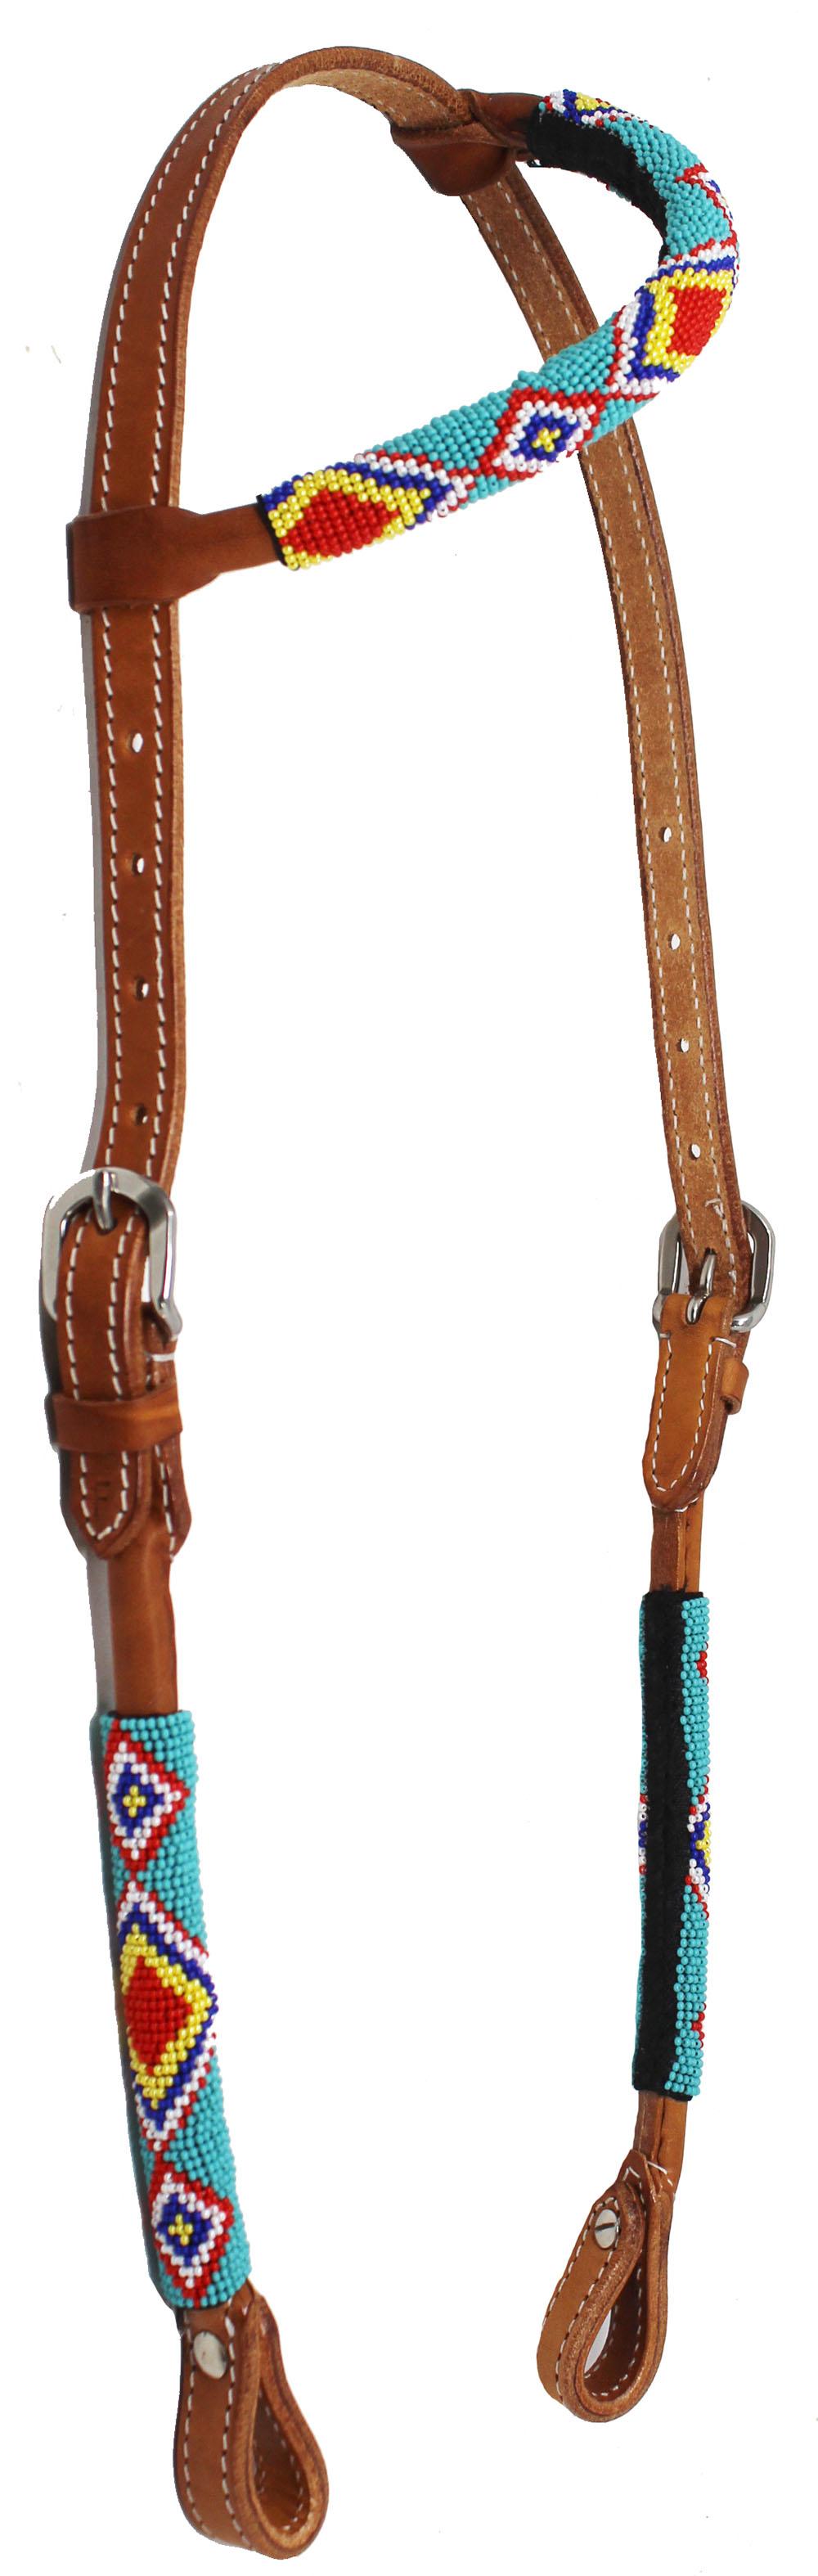 Horse Show Bridle Western Leather Headstall Beaded One Ear 79RT05HA